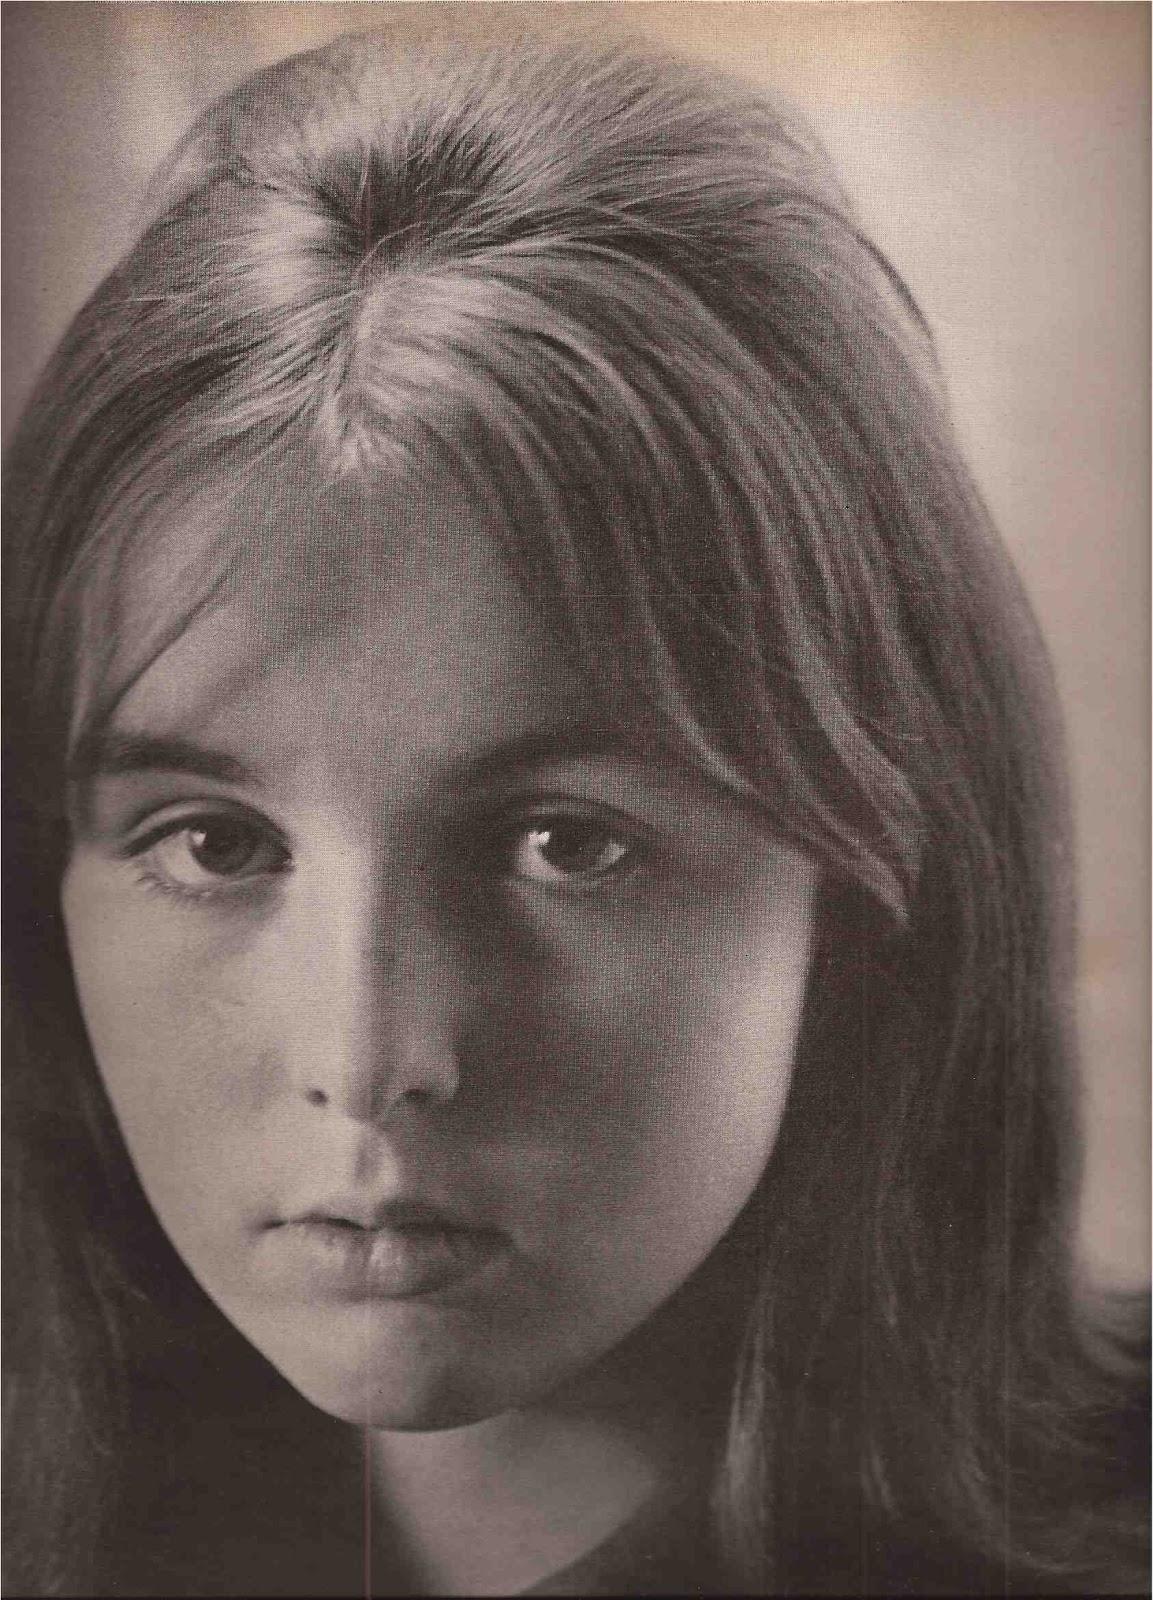 http://2.bp.blogspot.com/-PQrc4RHi2NY/UH5CgZTRLhI/AAAAAAAAI5Y/psyaKnjPo0Q/s1600/Youthquakers+Vogue+January+1965-18.jpg